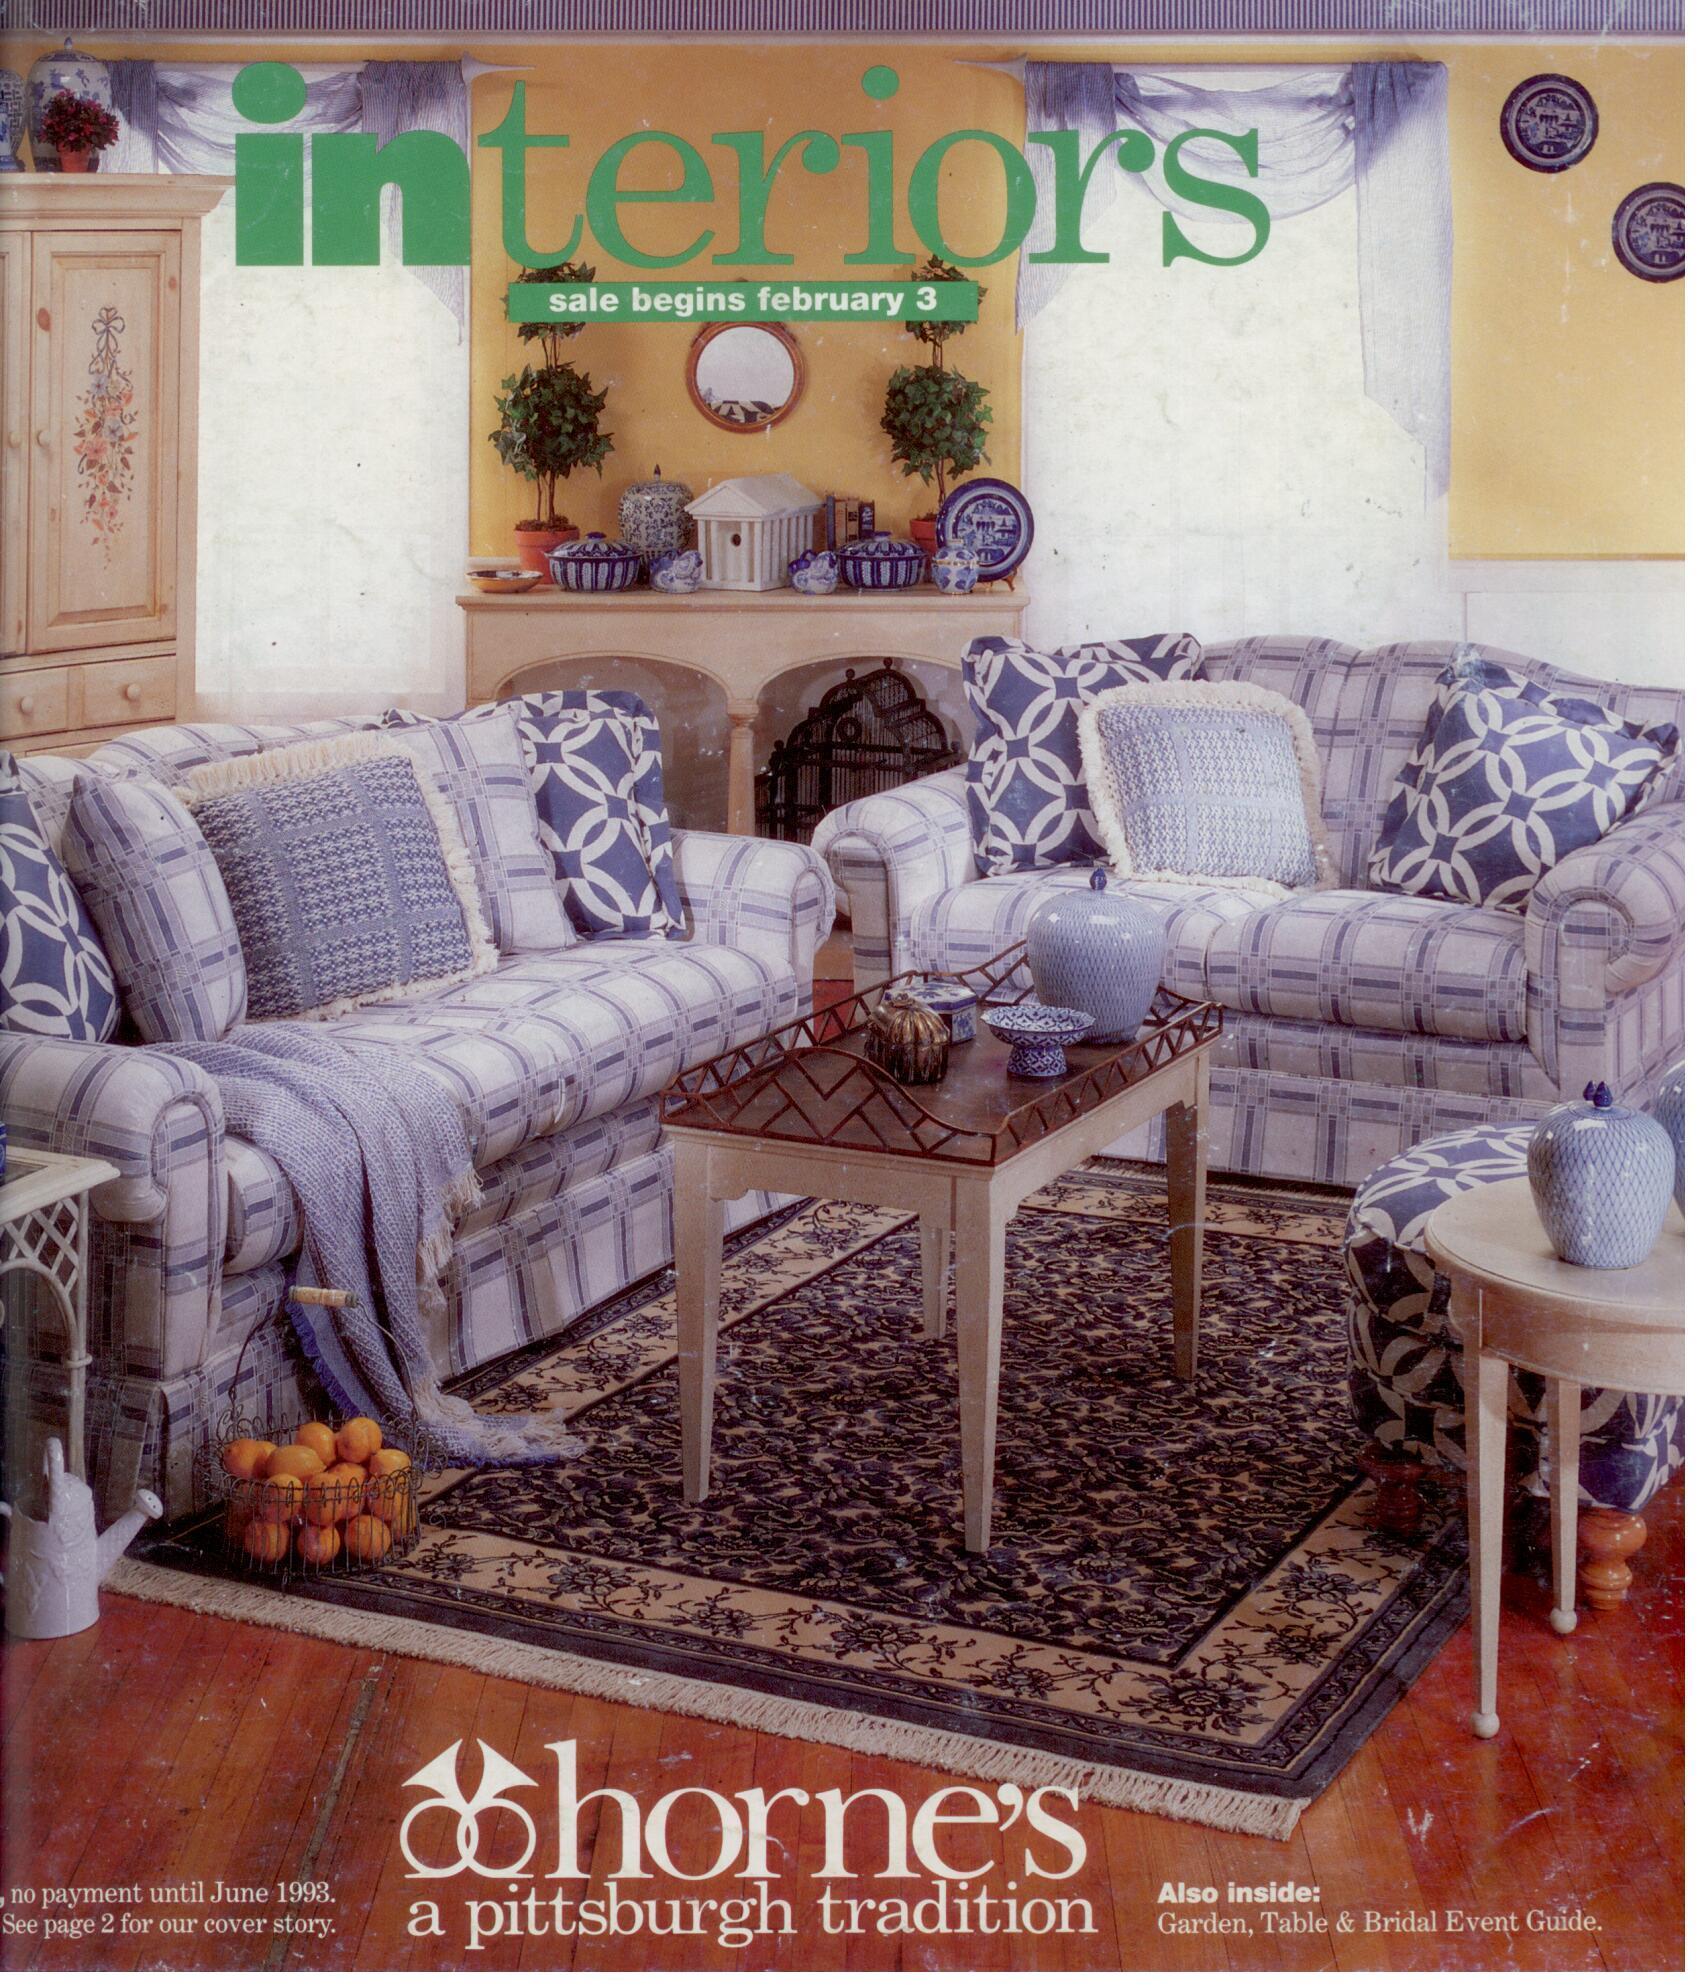 Interior Decorating, Furniture Displays, Store U0026 Fixture Design | CG Visual  Creations